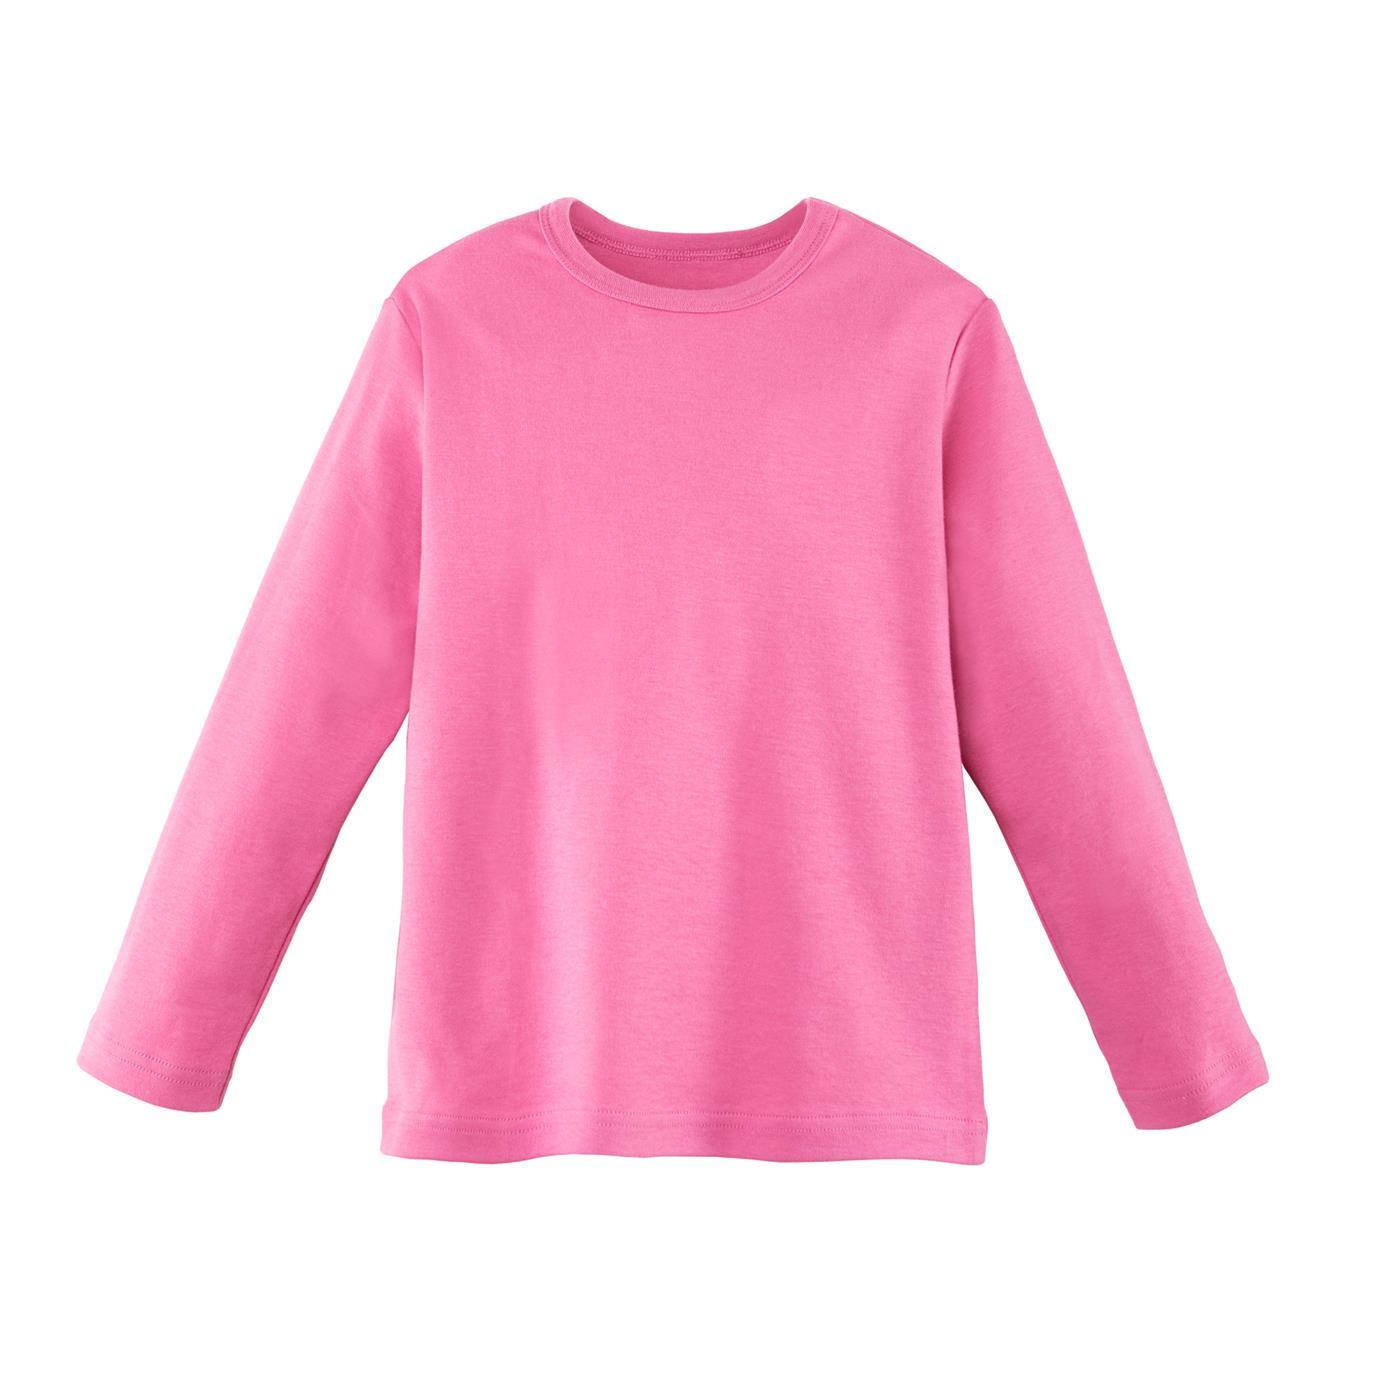 Living Crafts Pink Long Sleeve Shirt for Kids